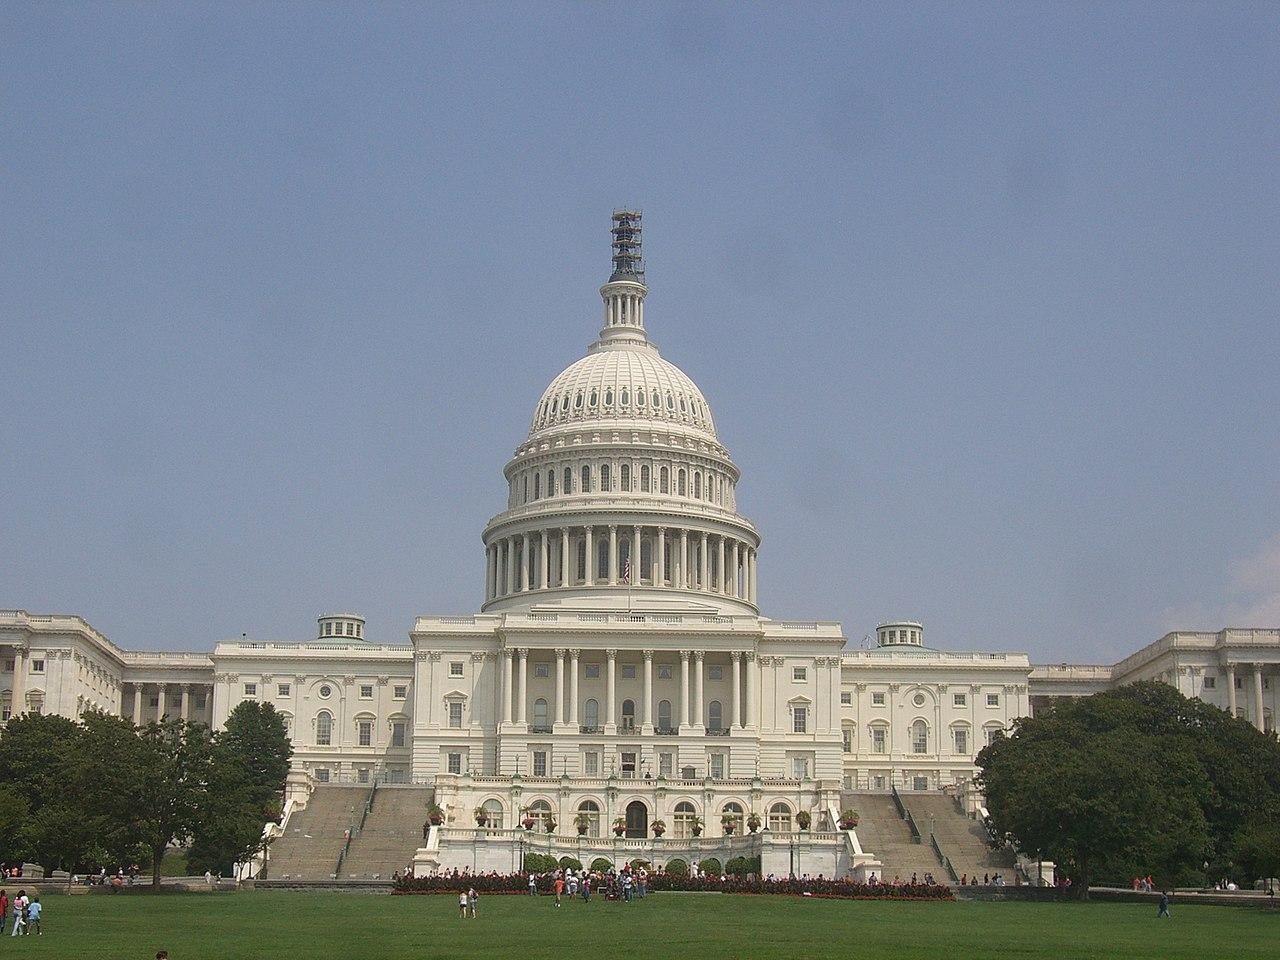 File:Capitol, Washington, D.C. USA3.jpg - Wikimedia Commons